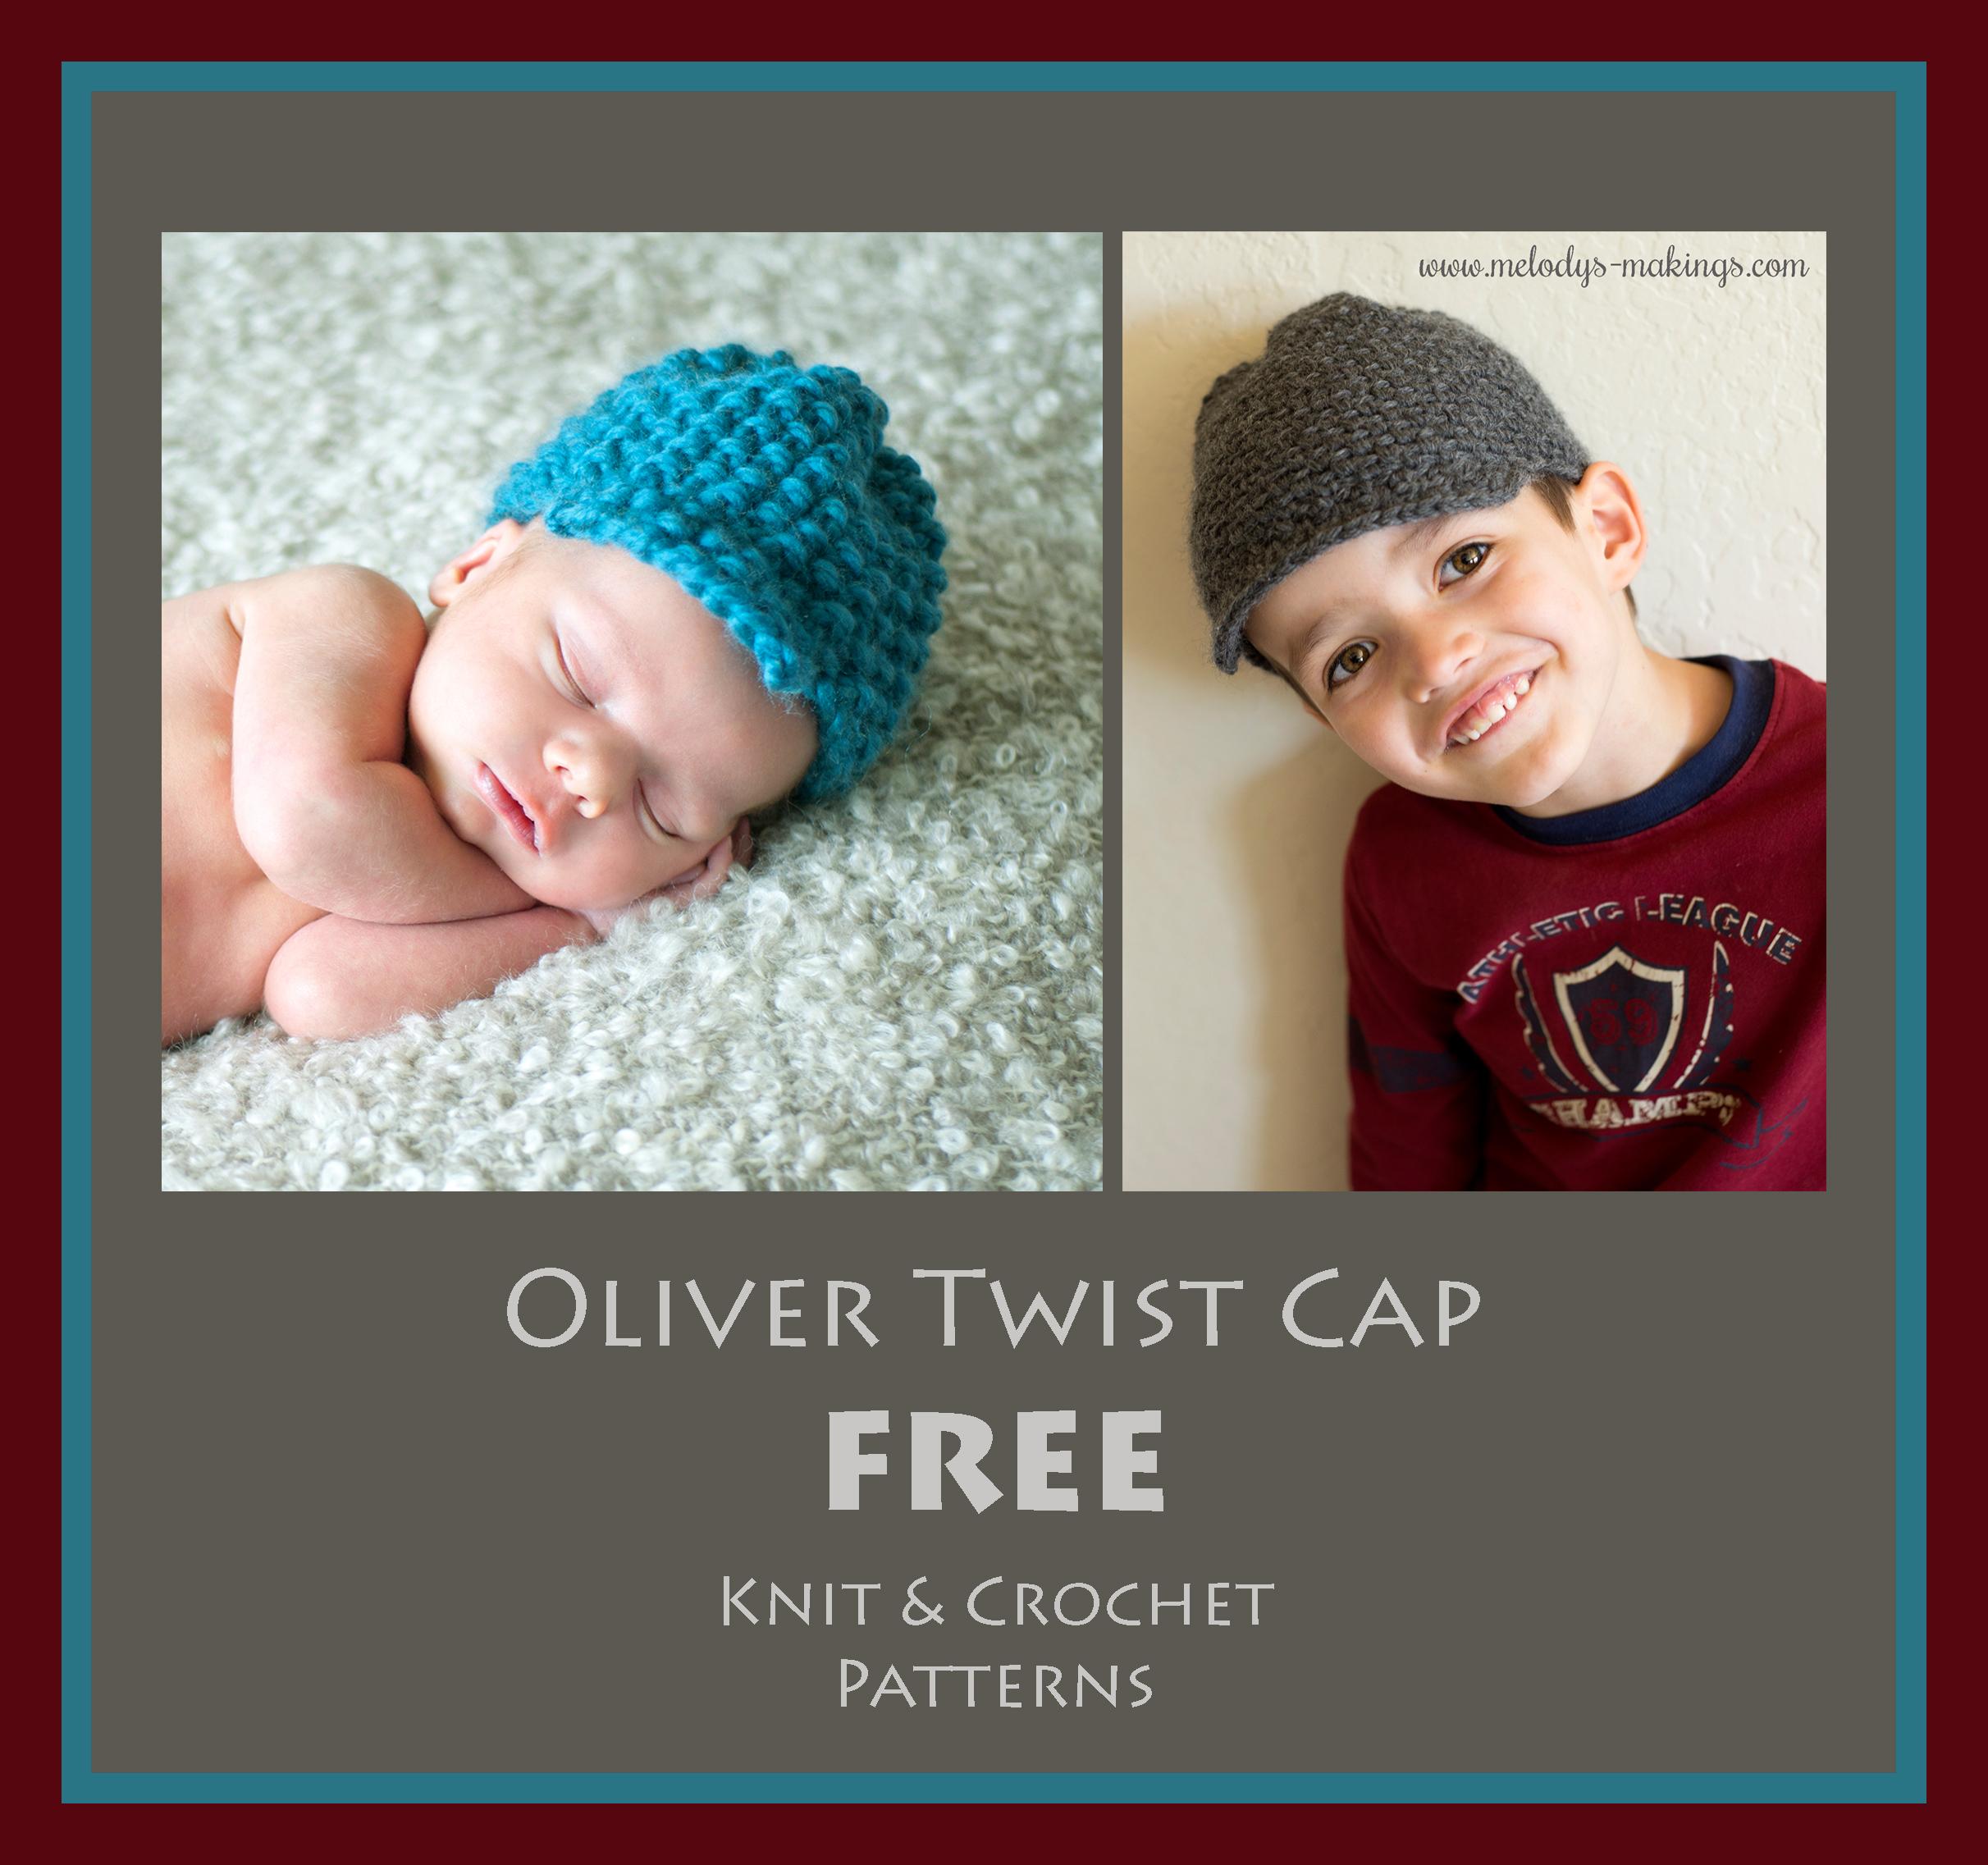 Oliver Twist Cap – Free Crochet & Knit Patterns! | Melody\'s Makings